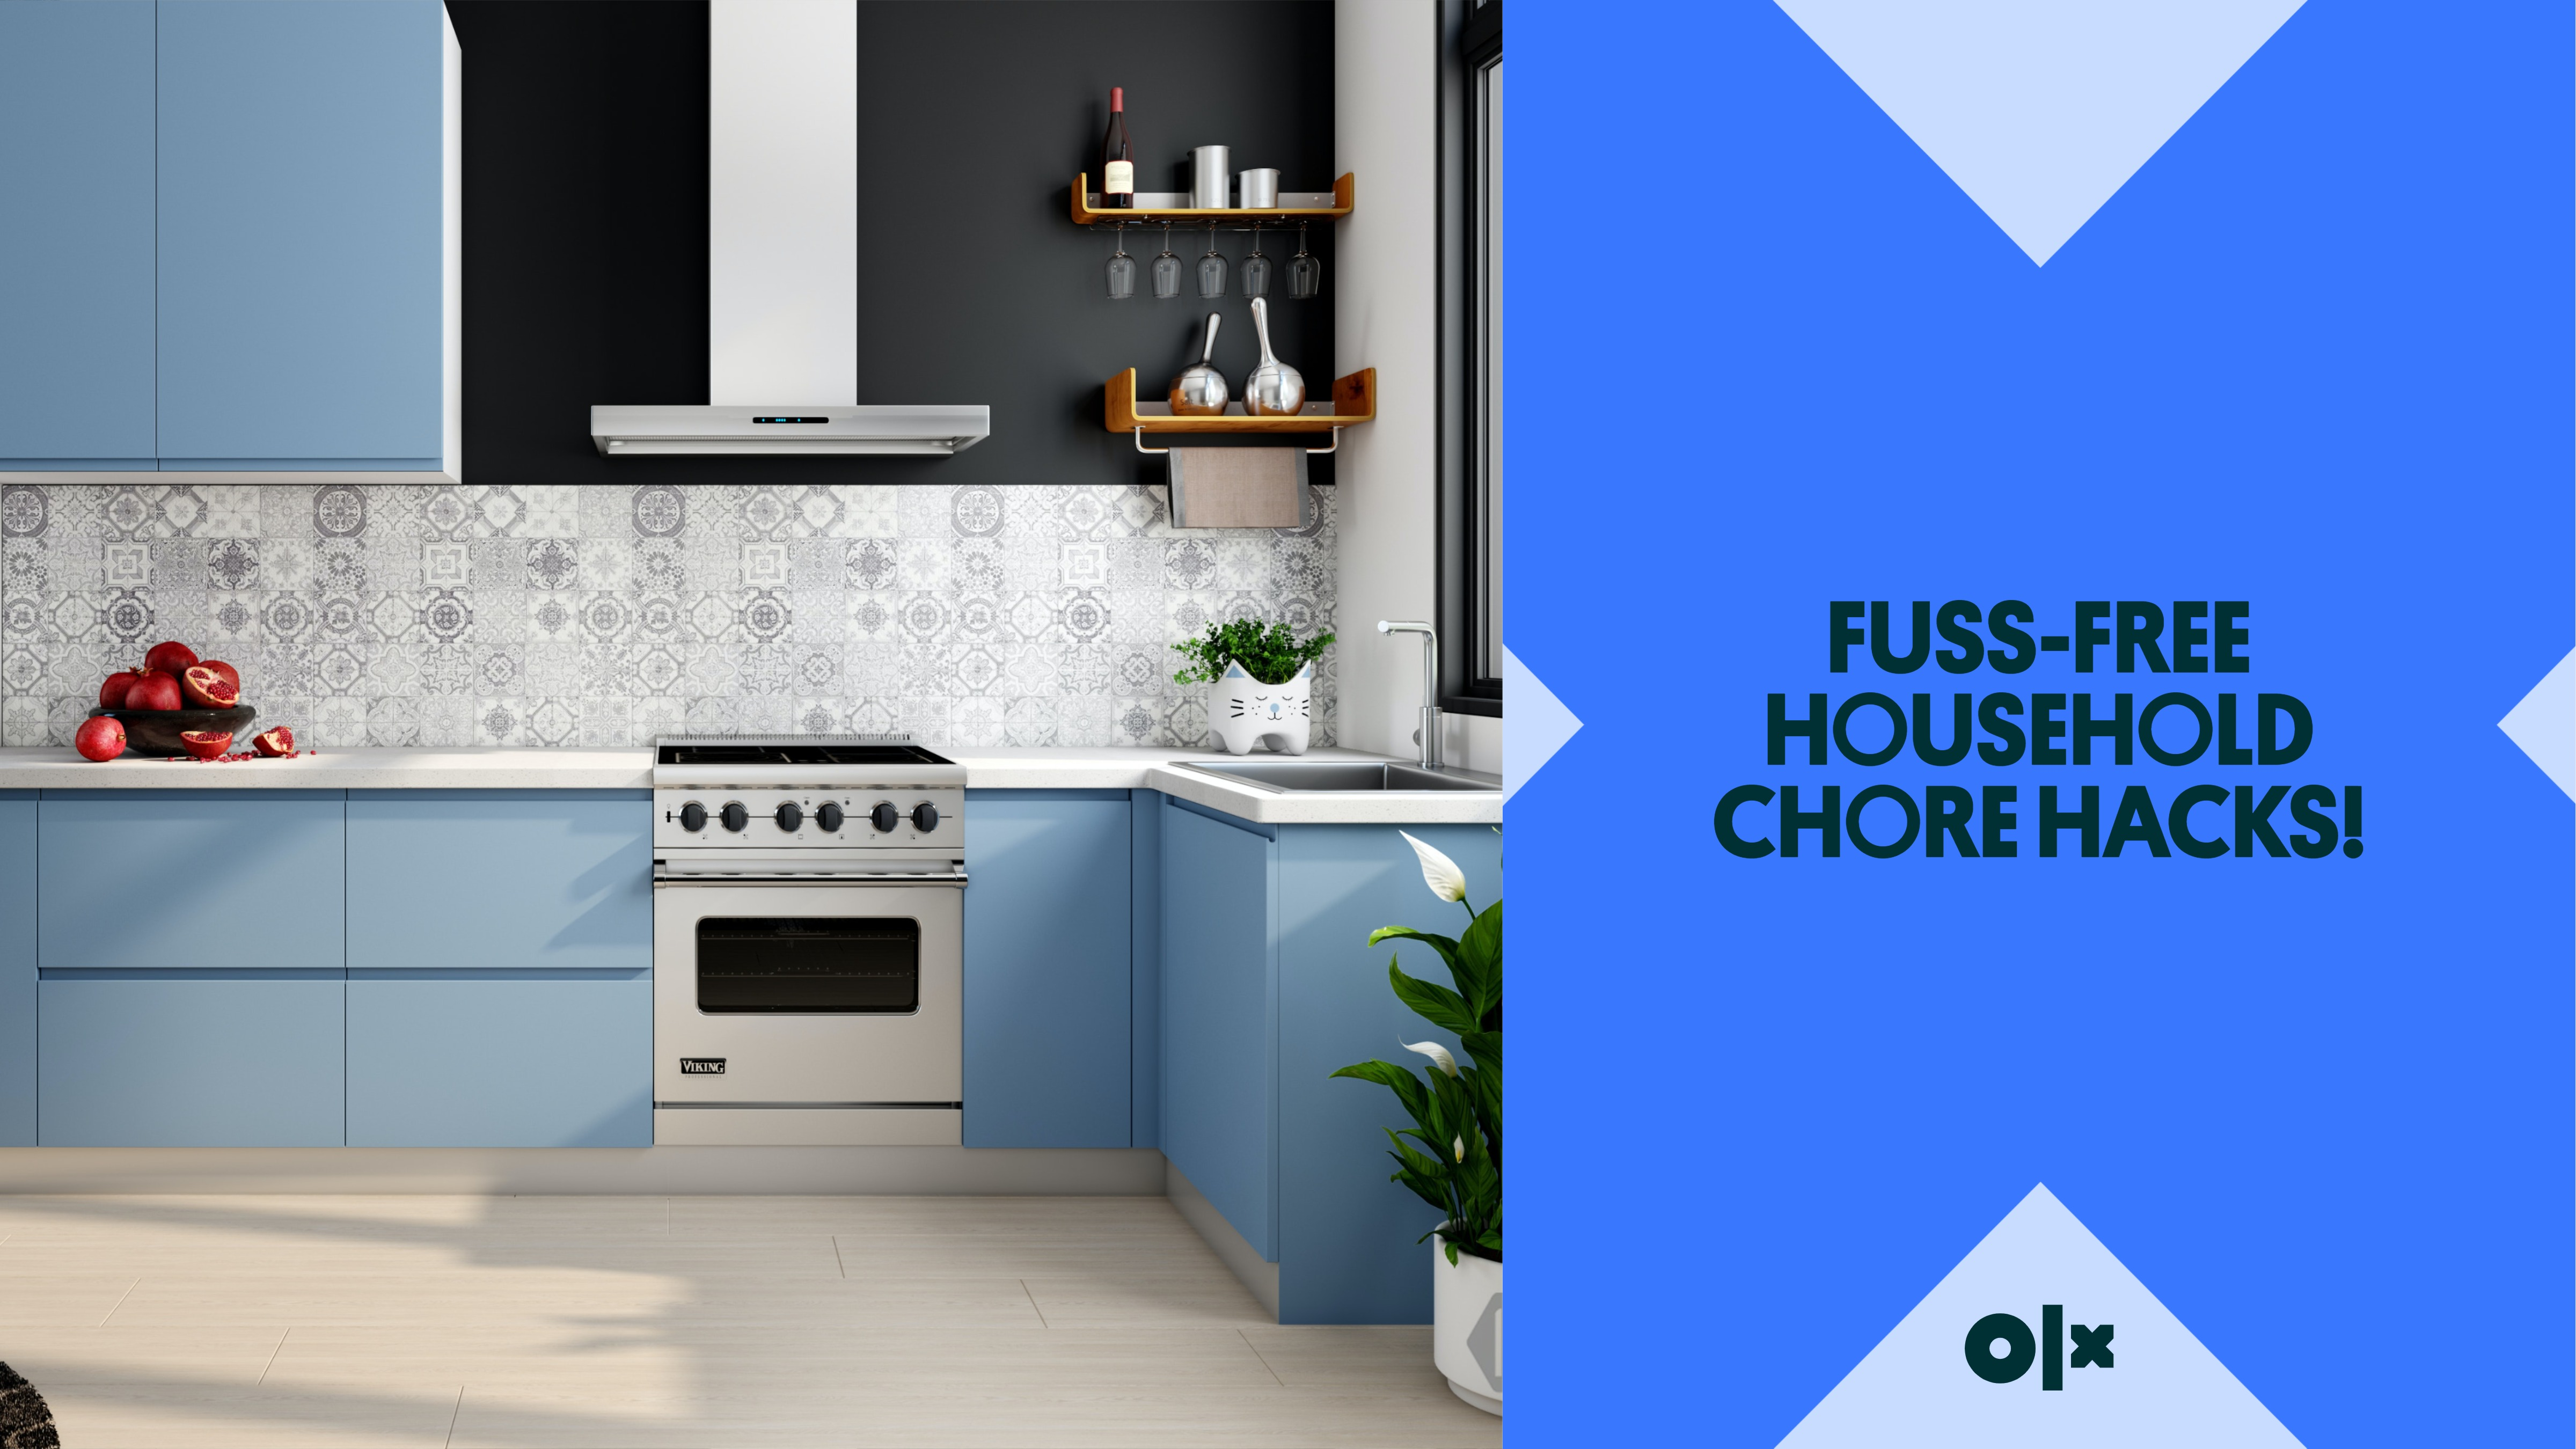 Fuss-free Household Chore Hacks!